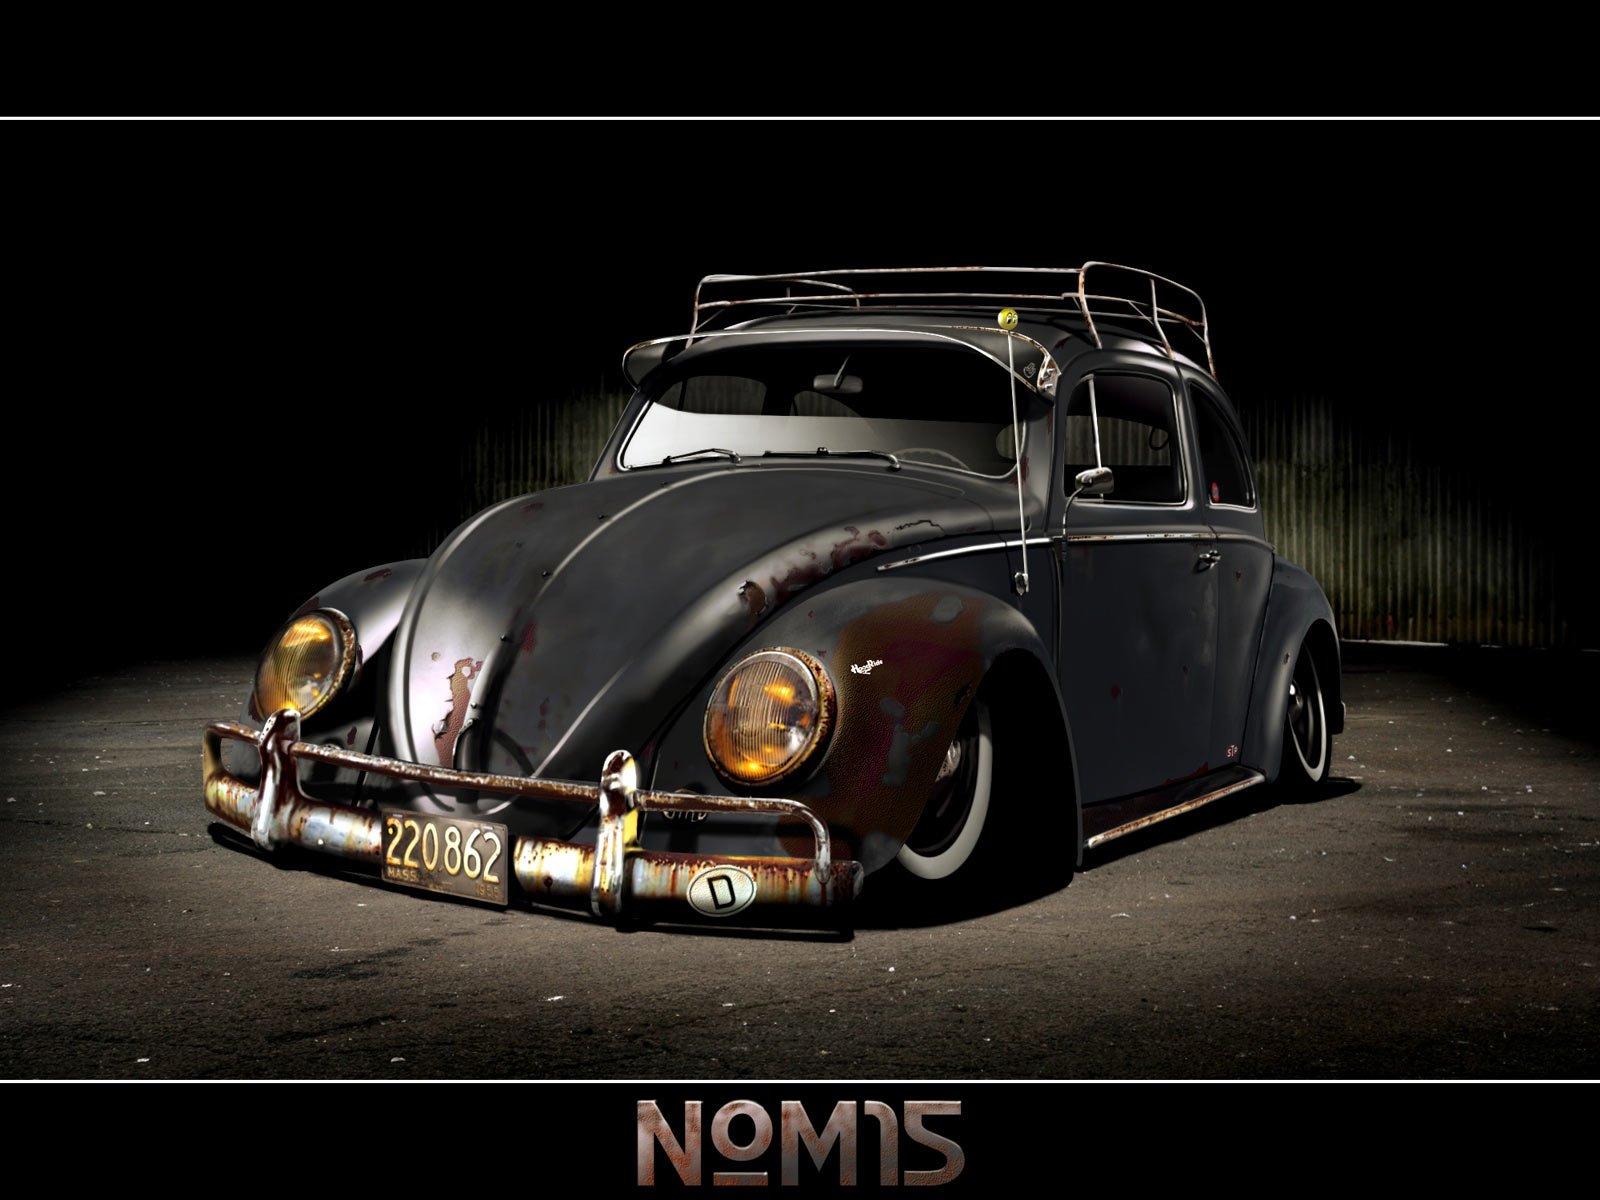 Old car wallpaper for desktop |Its My Car Club